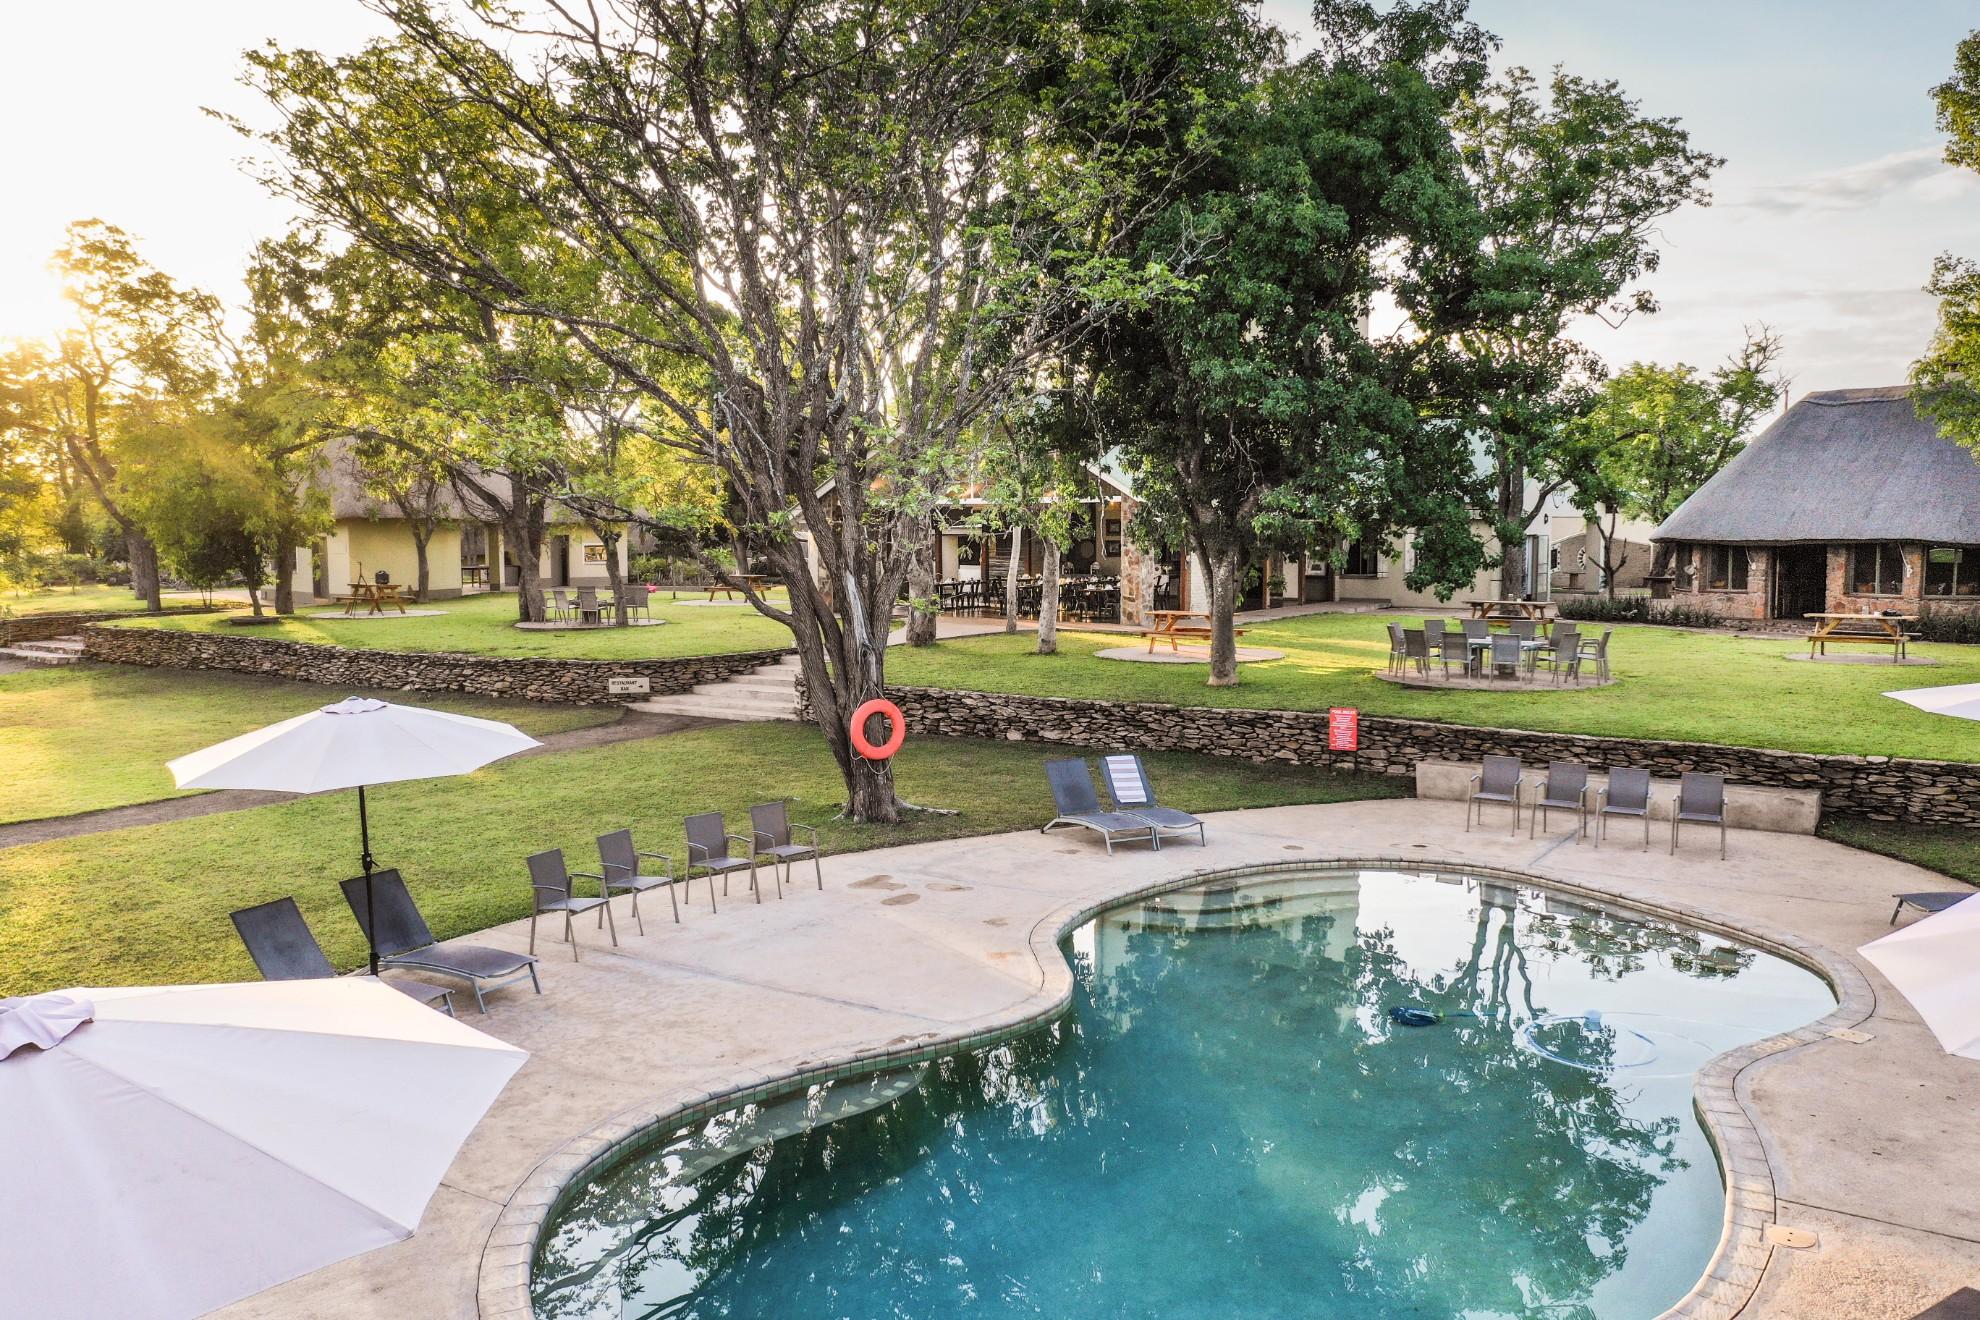 Robins Camp - Machaba Safaris - Hwange - Zimbabwe Pool and Gardens